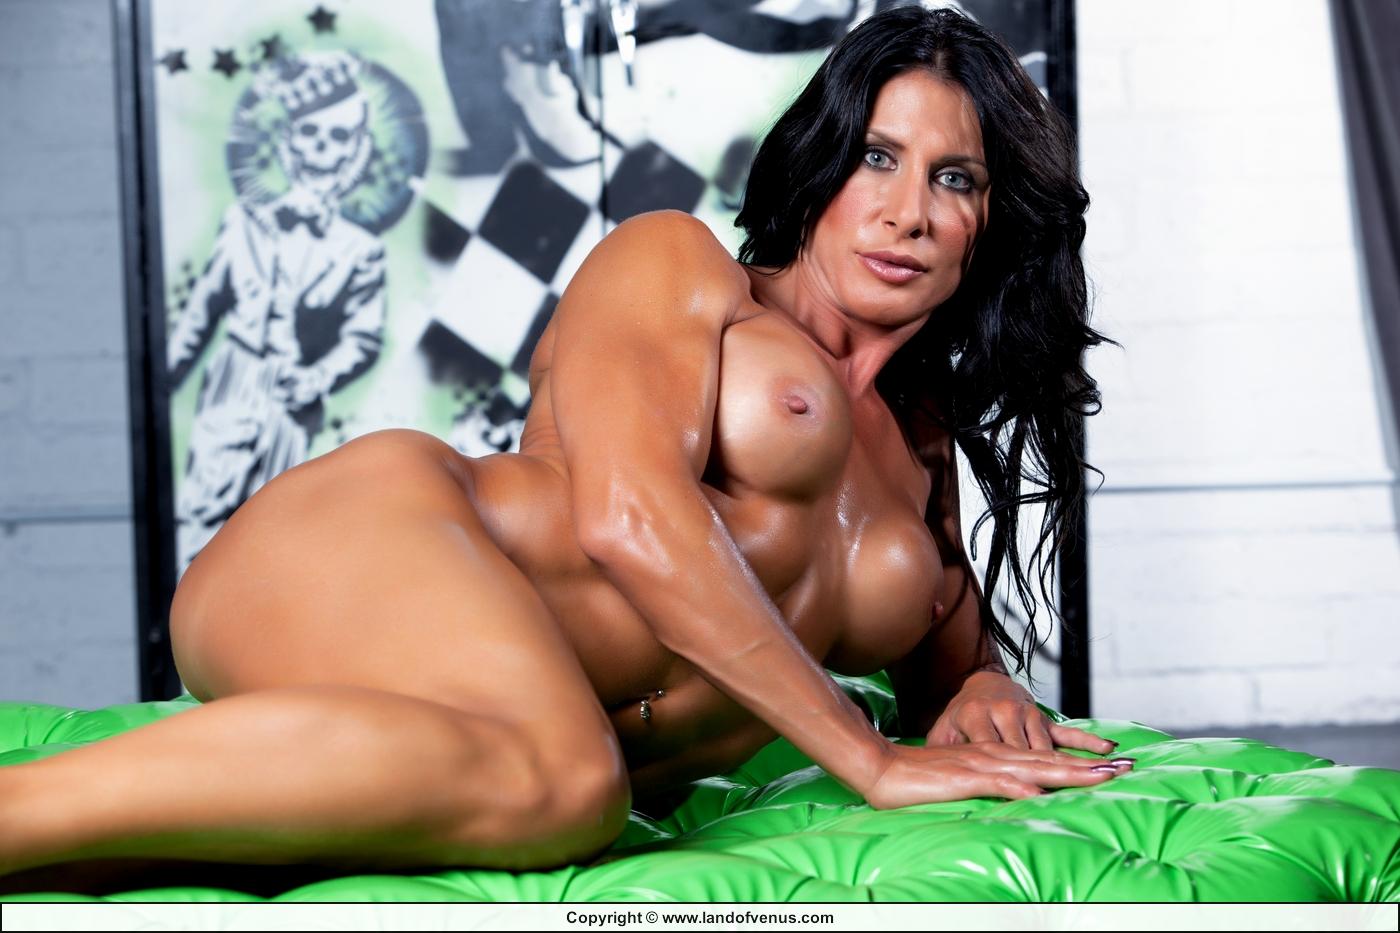 Nudes Of Npc Physique Competitor Fern Assard